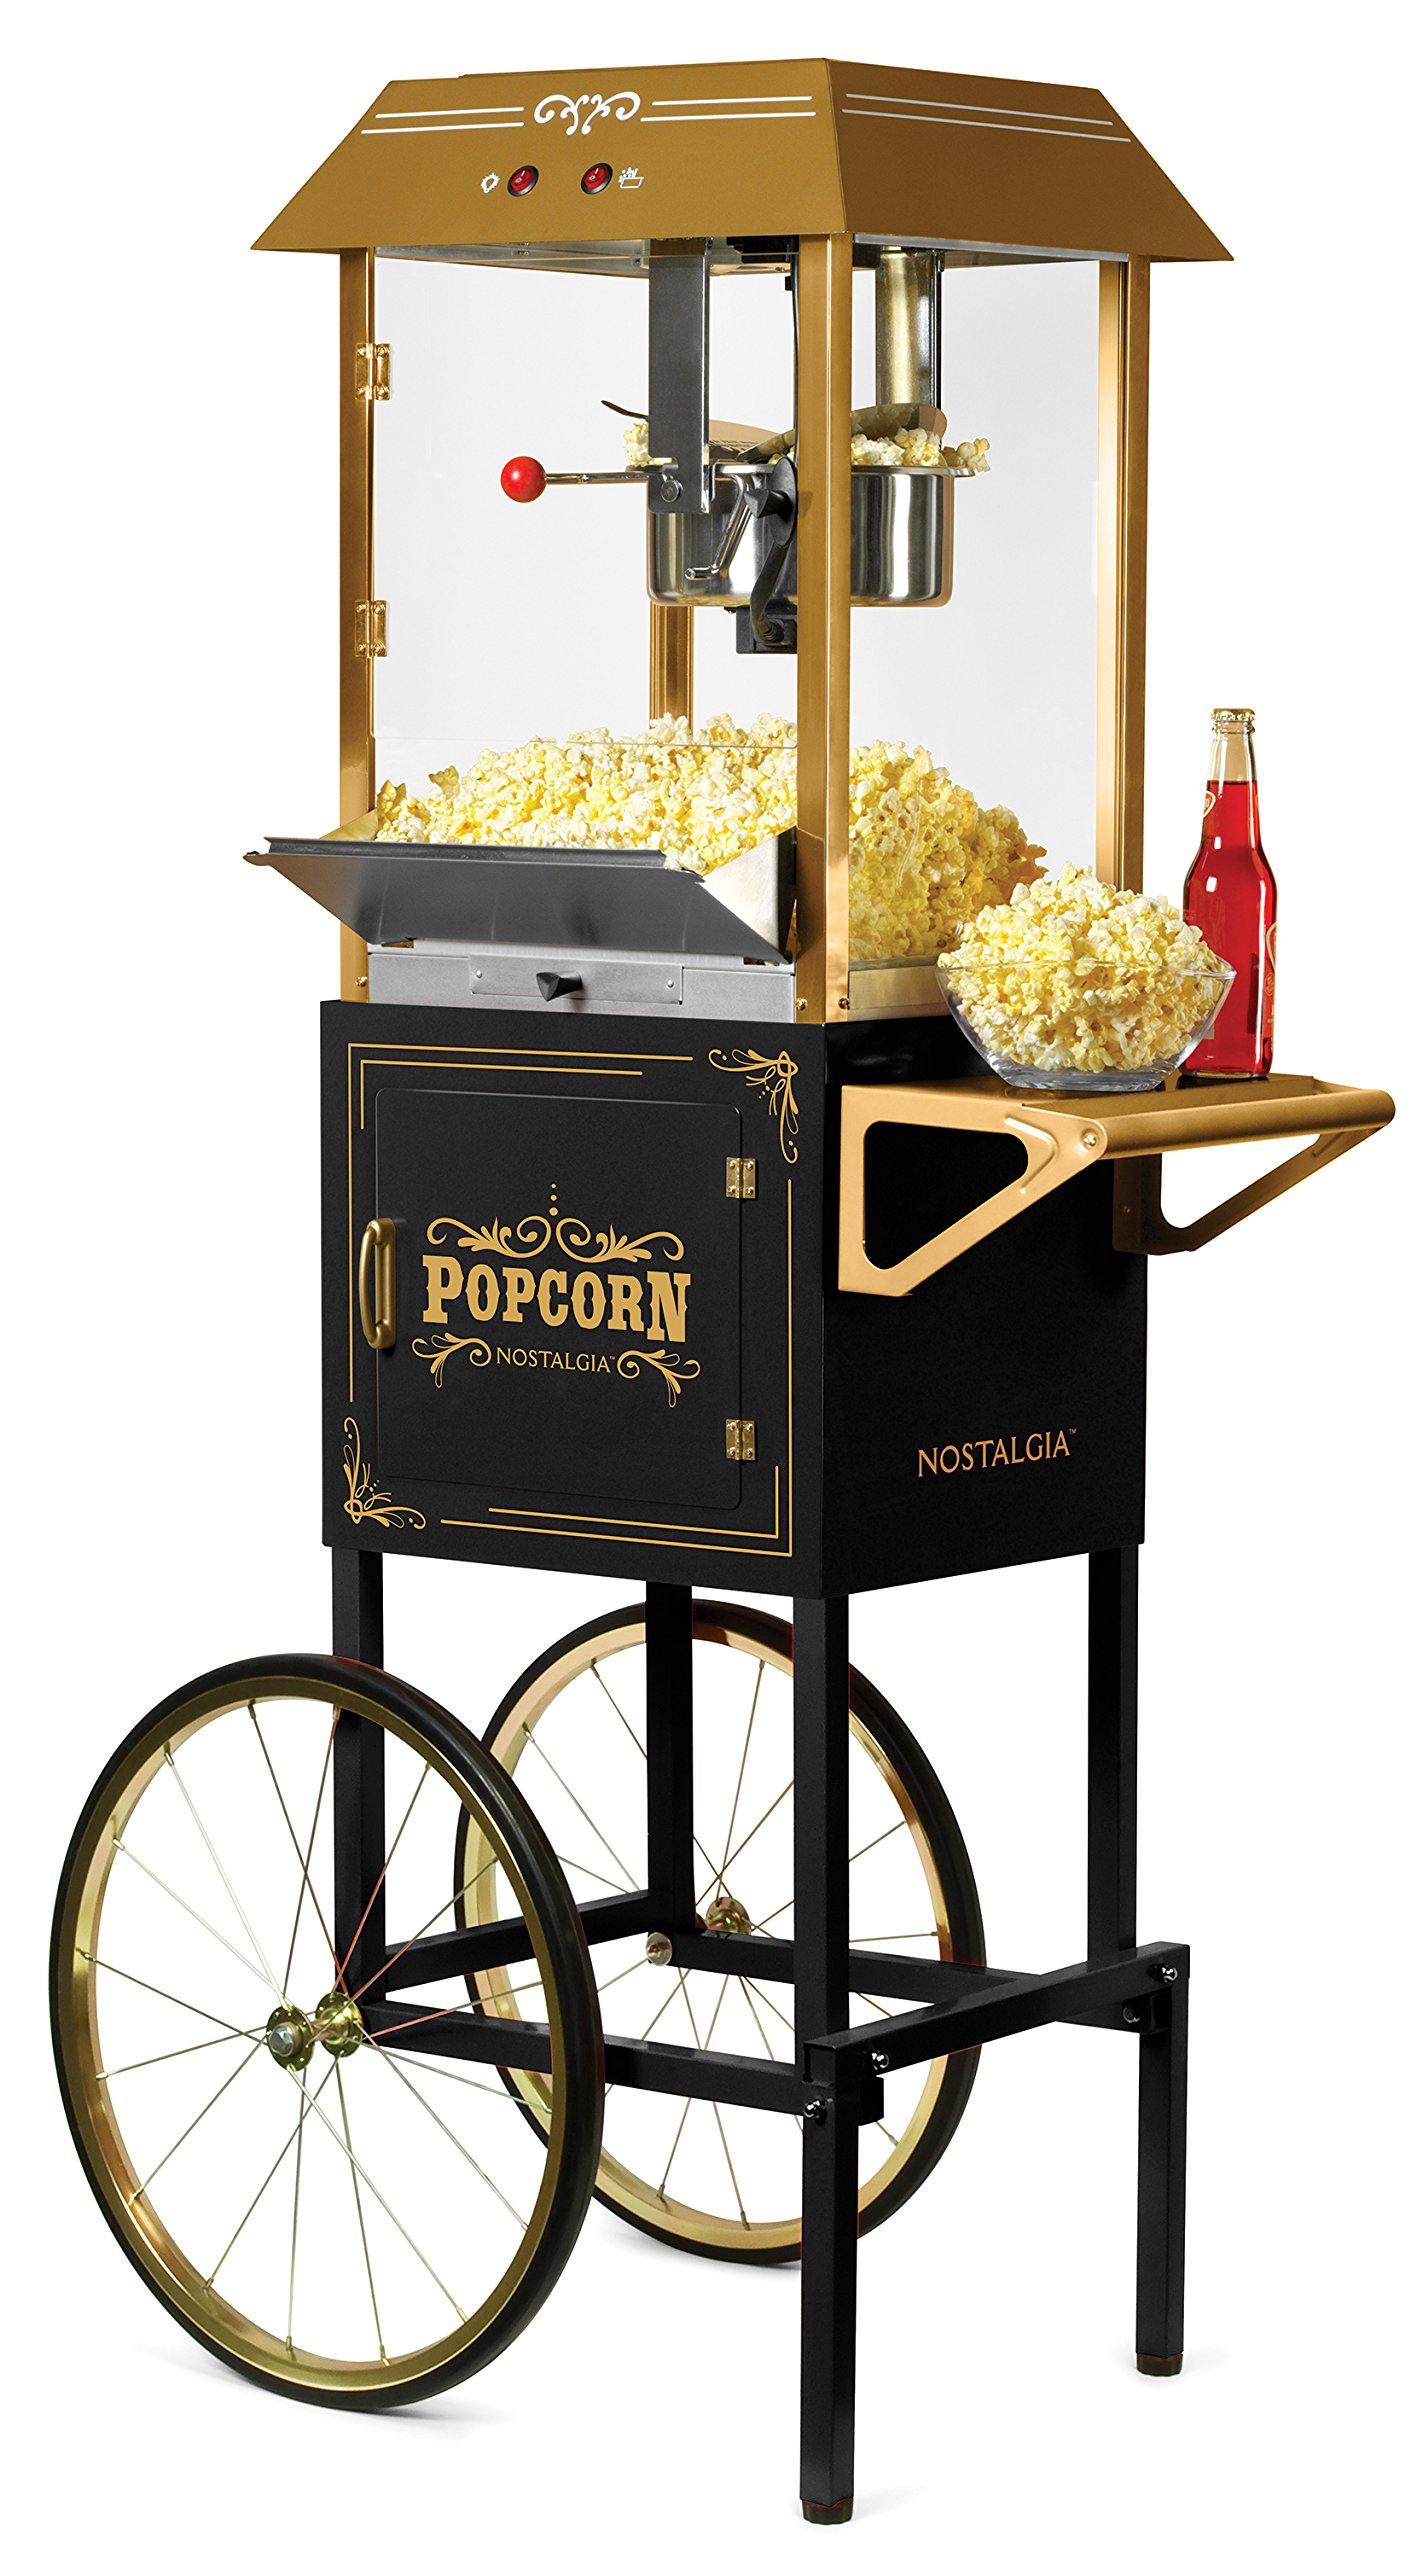 Nostalgia CCP1000BLK Vintage Professional Popcorn Cart - 59 Inches Tall, 10 oz, Black by NOSTALGIA